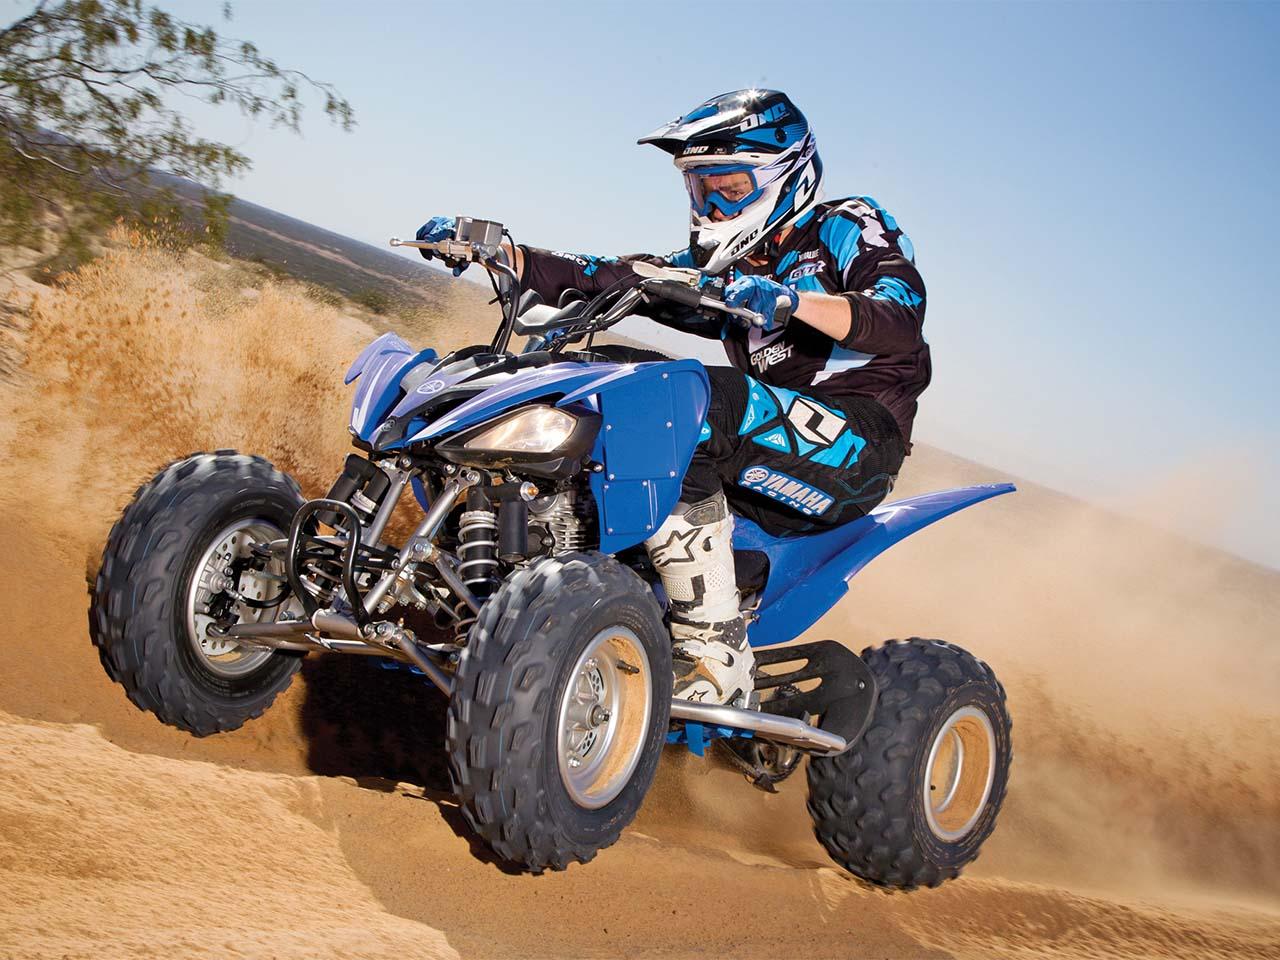 Adenture sports - ATV Riding